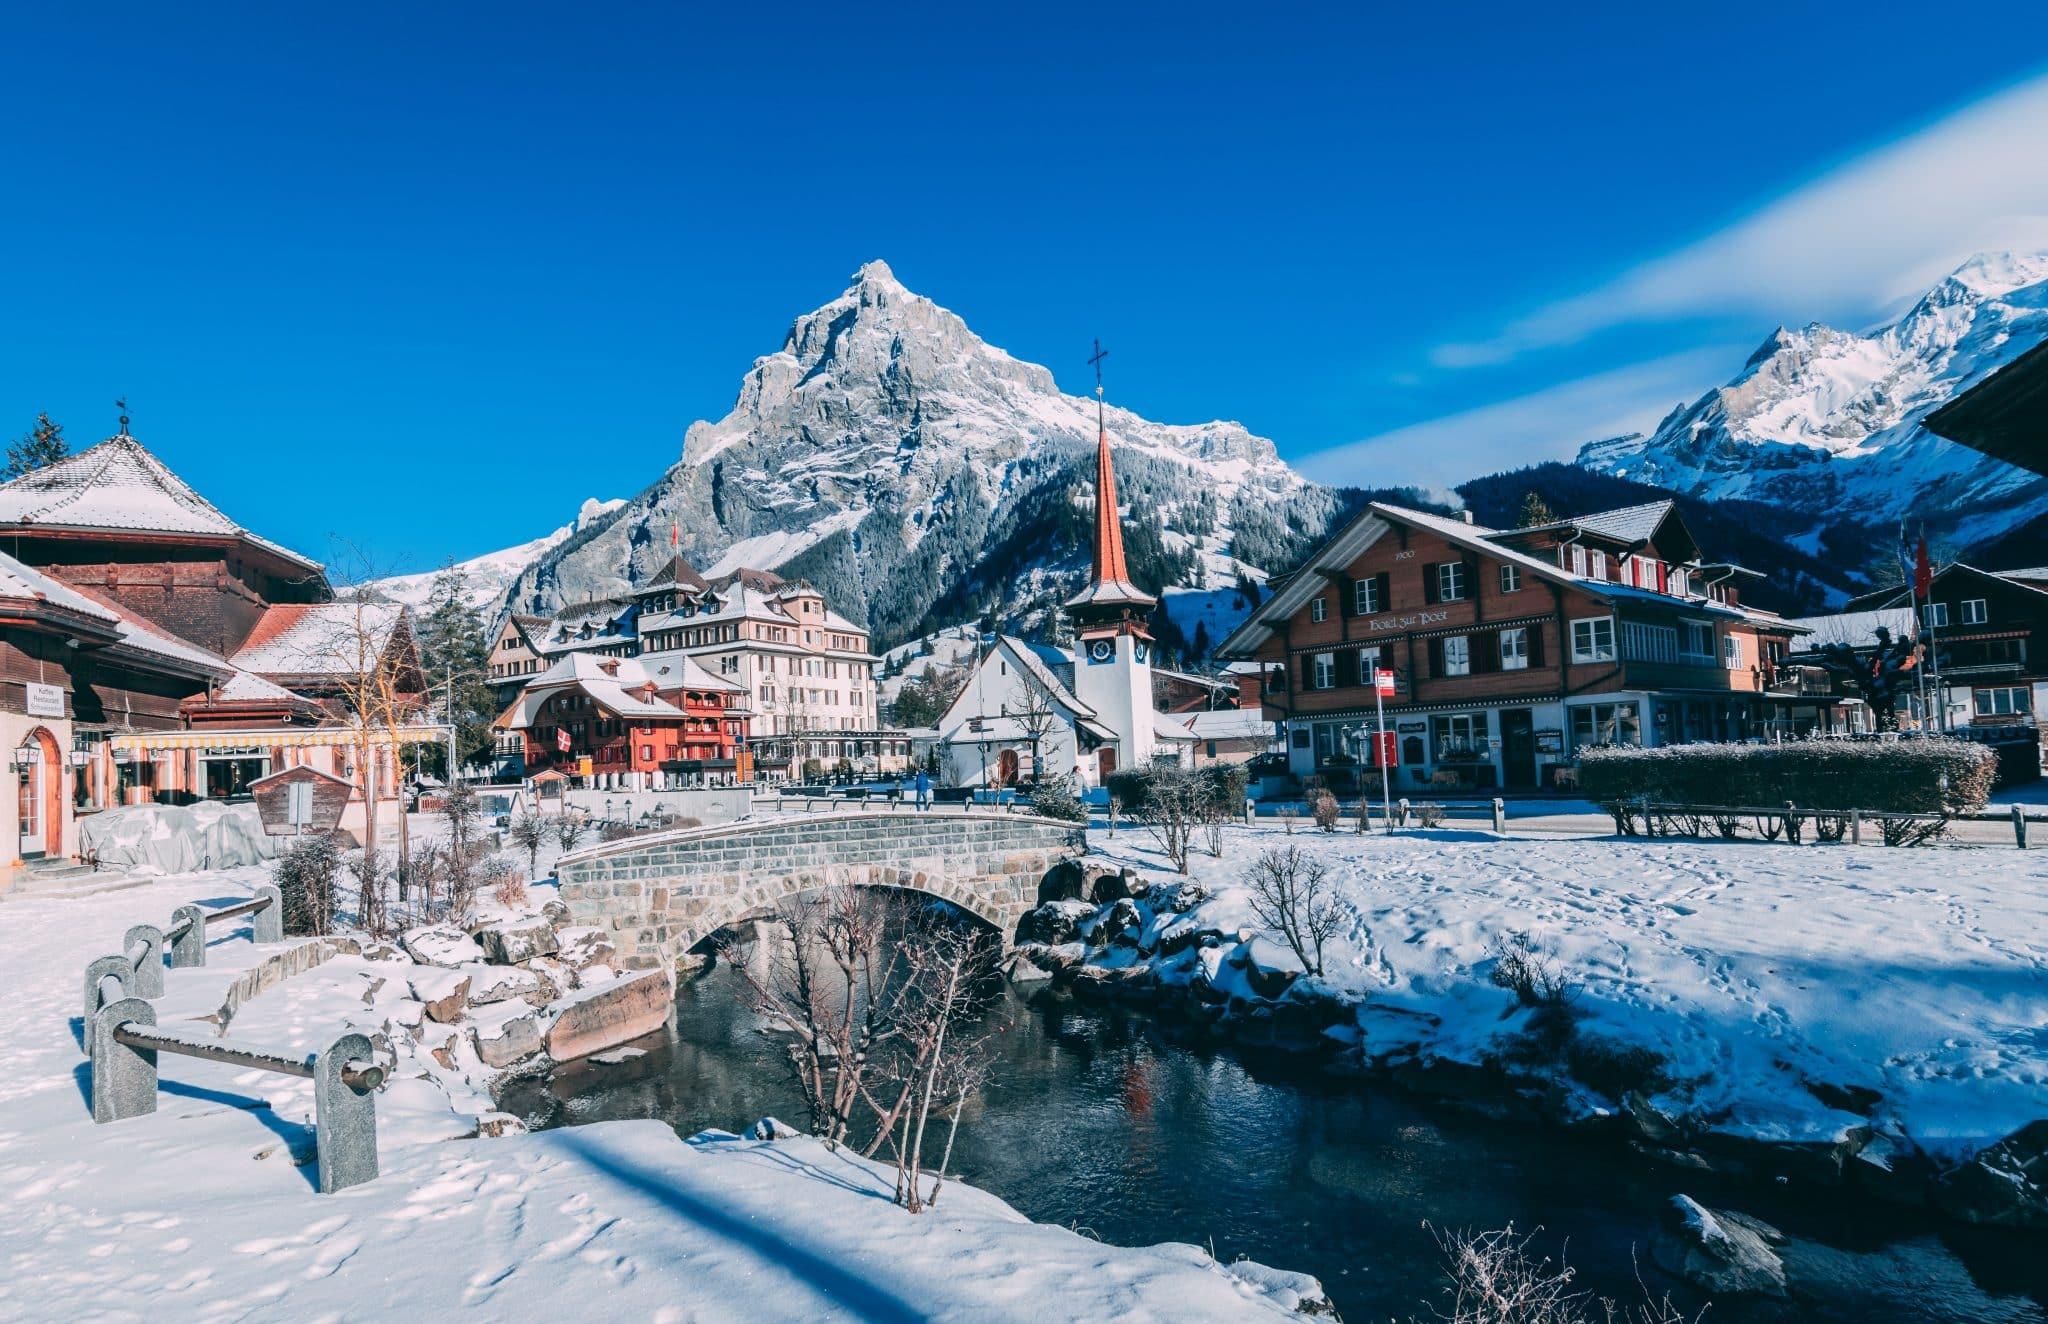 Swiss Apls